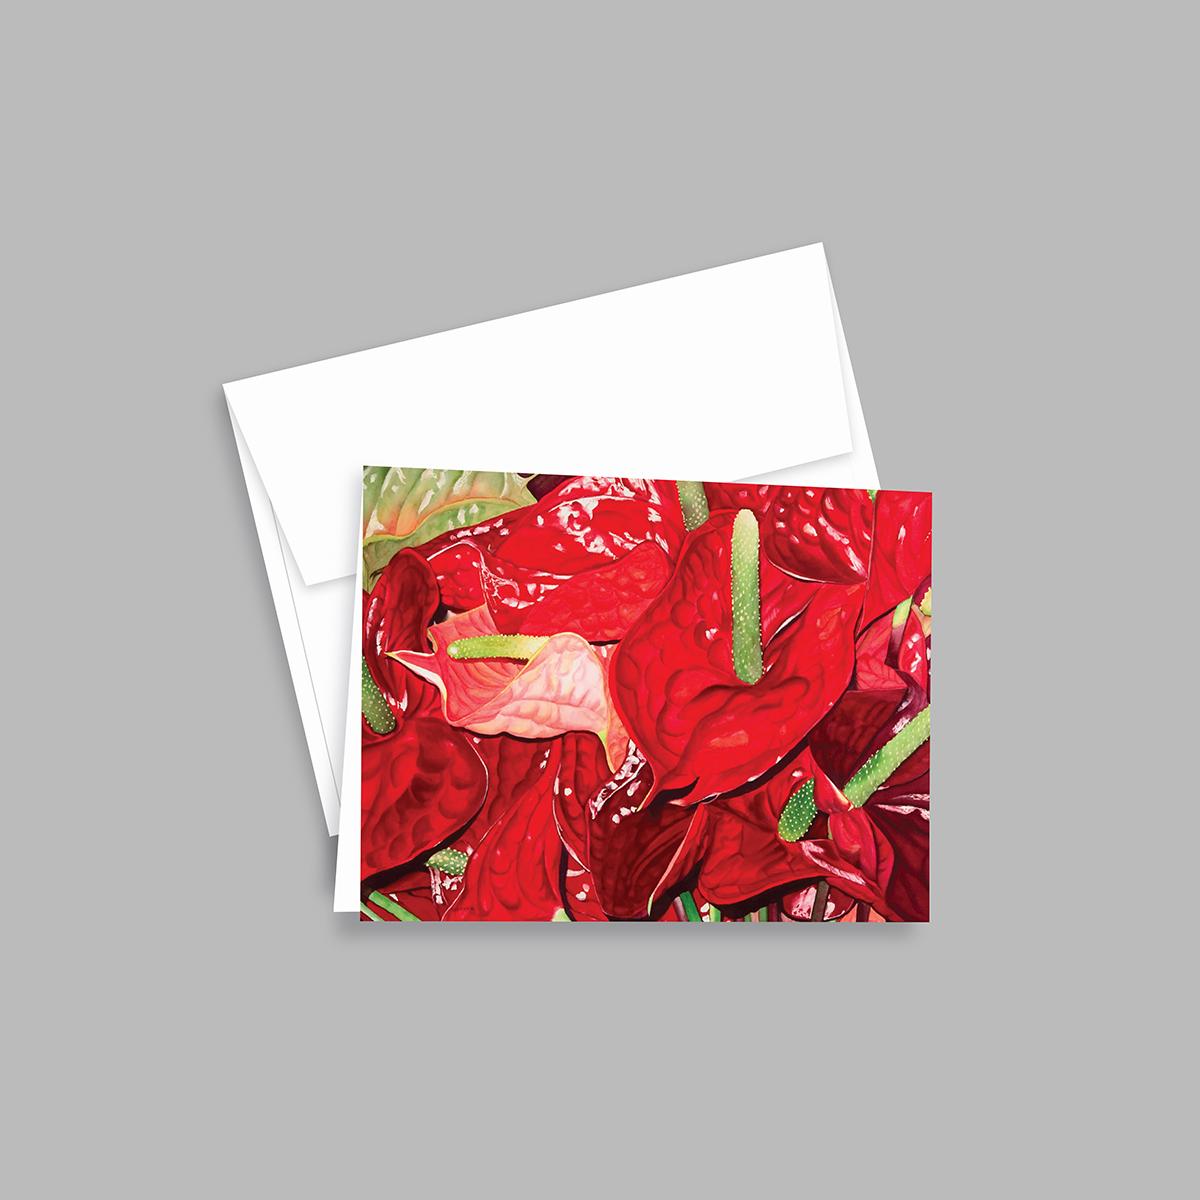 Voluptuous Anthuriums by Lynda White